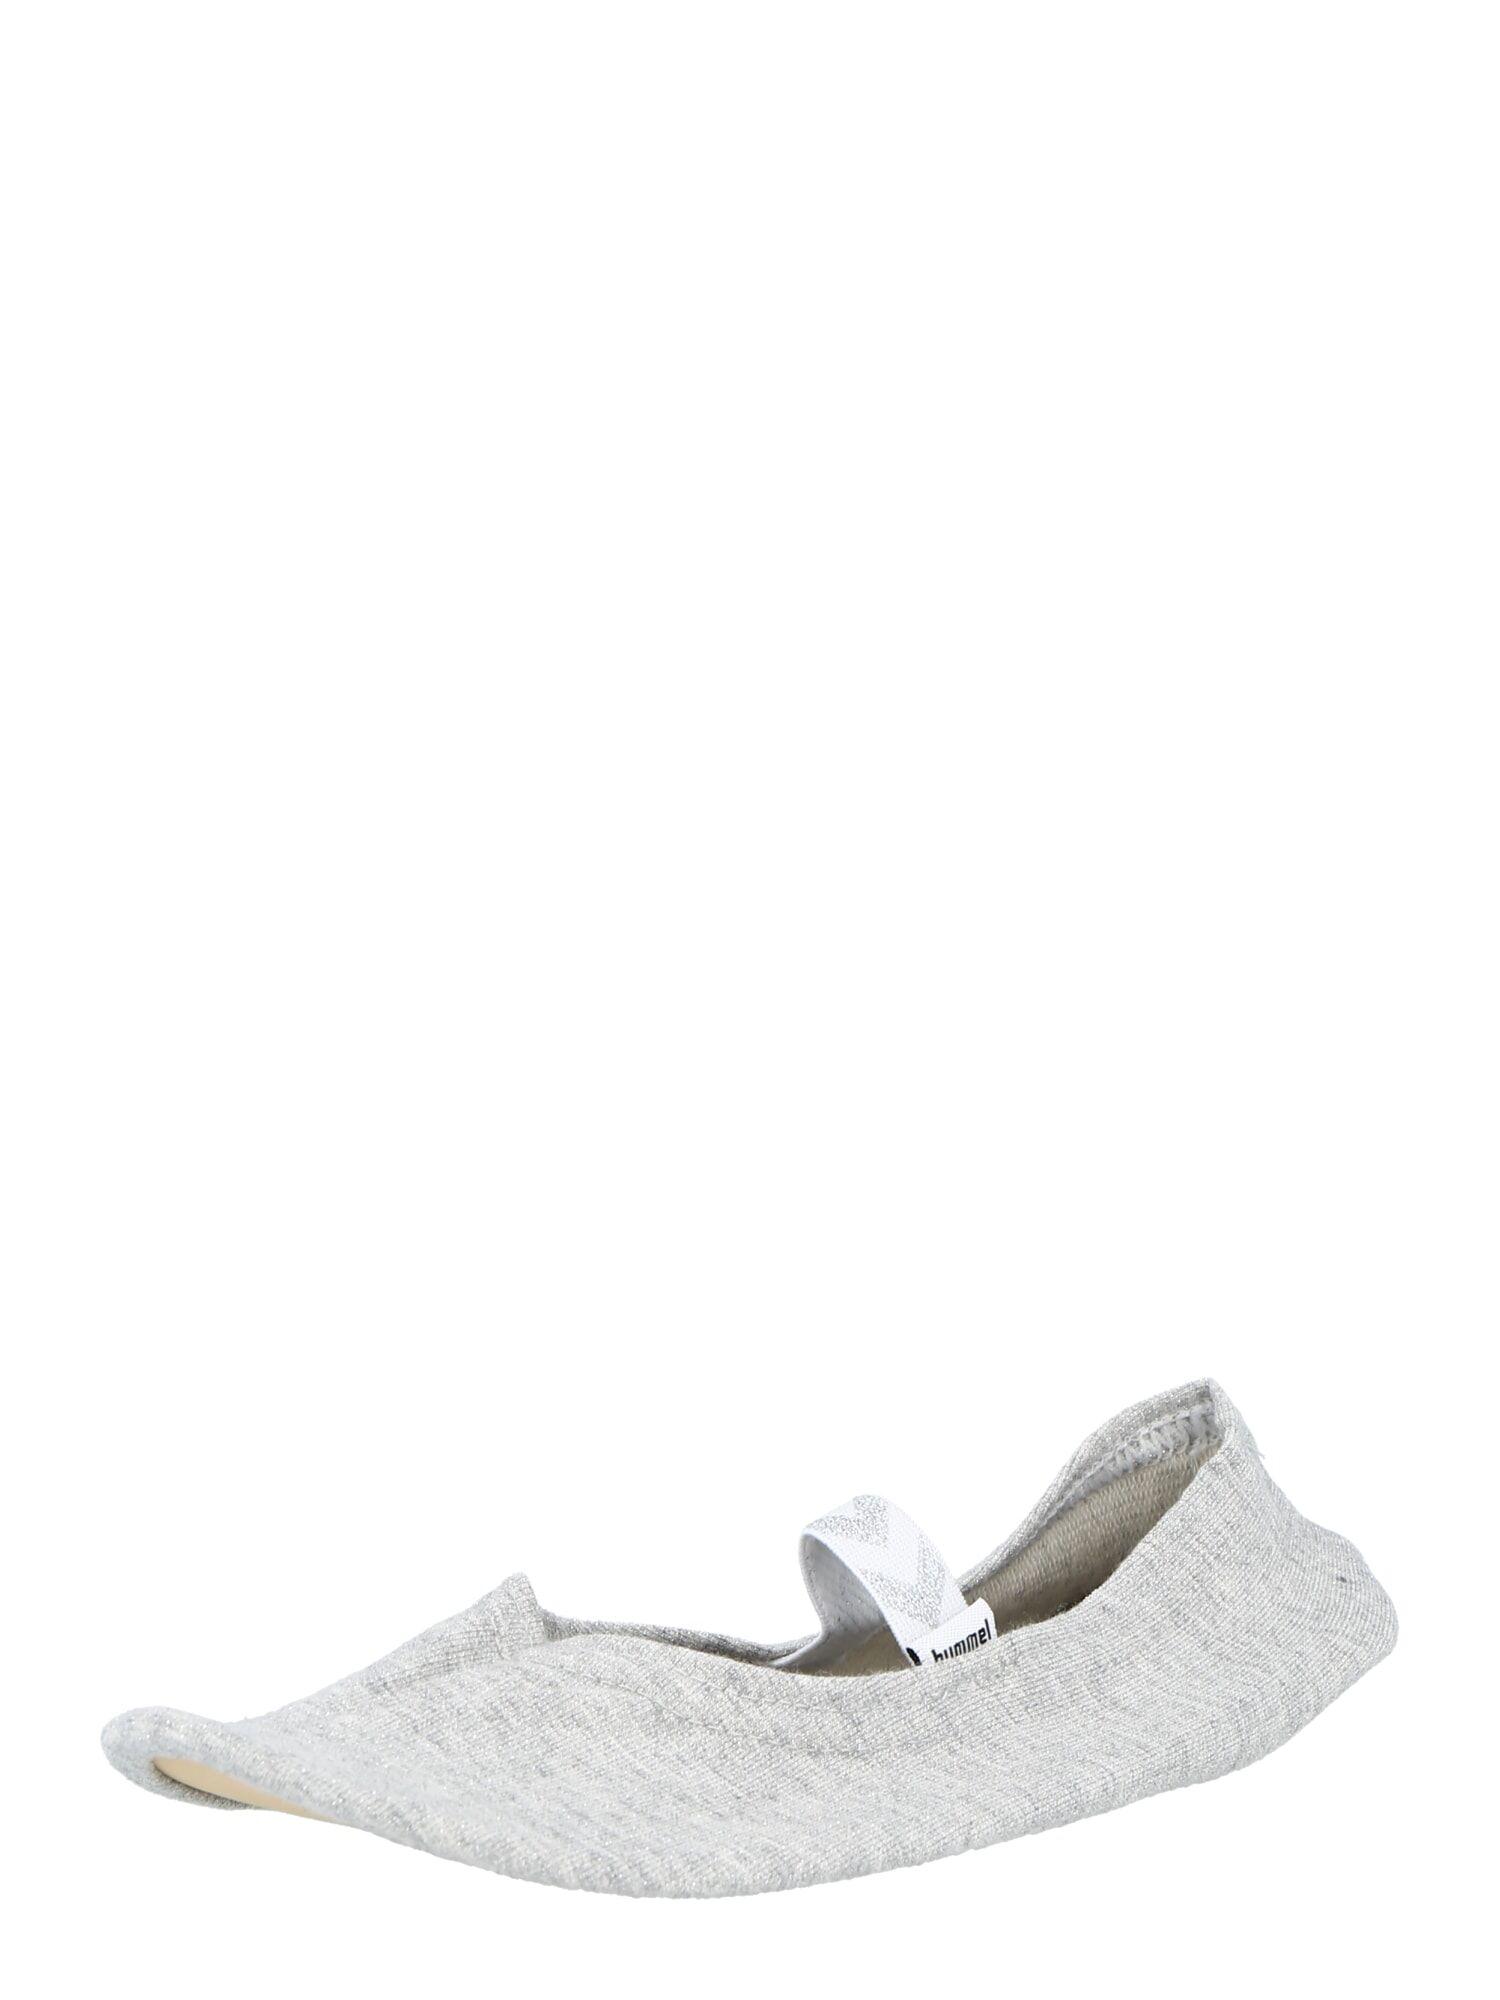 Hummel Chaussure de sport  - Gris - Taille: 37 - boy